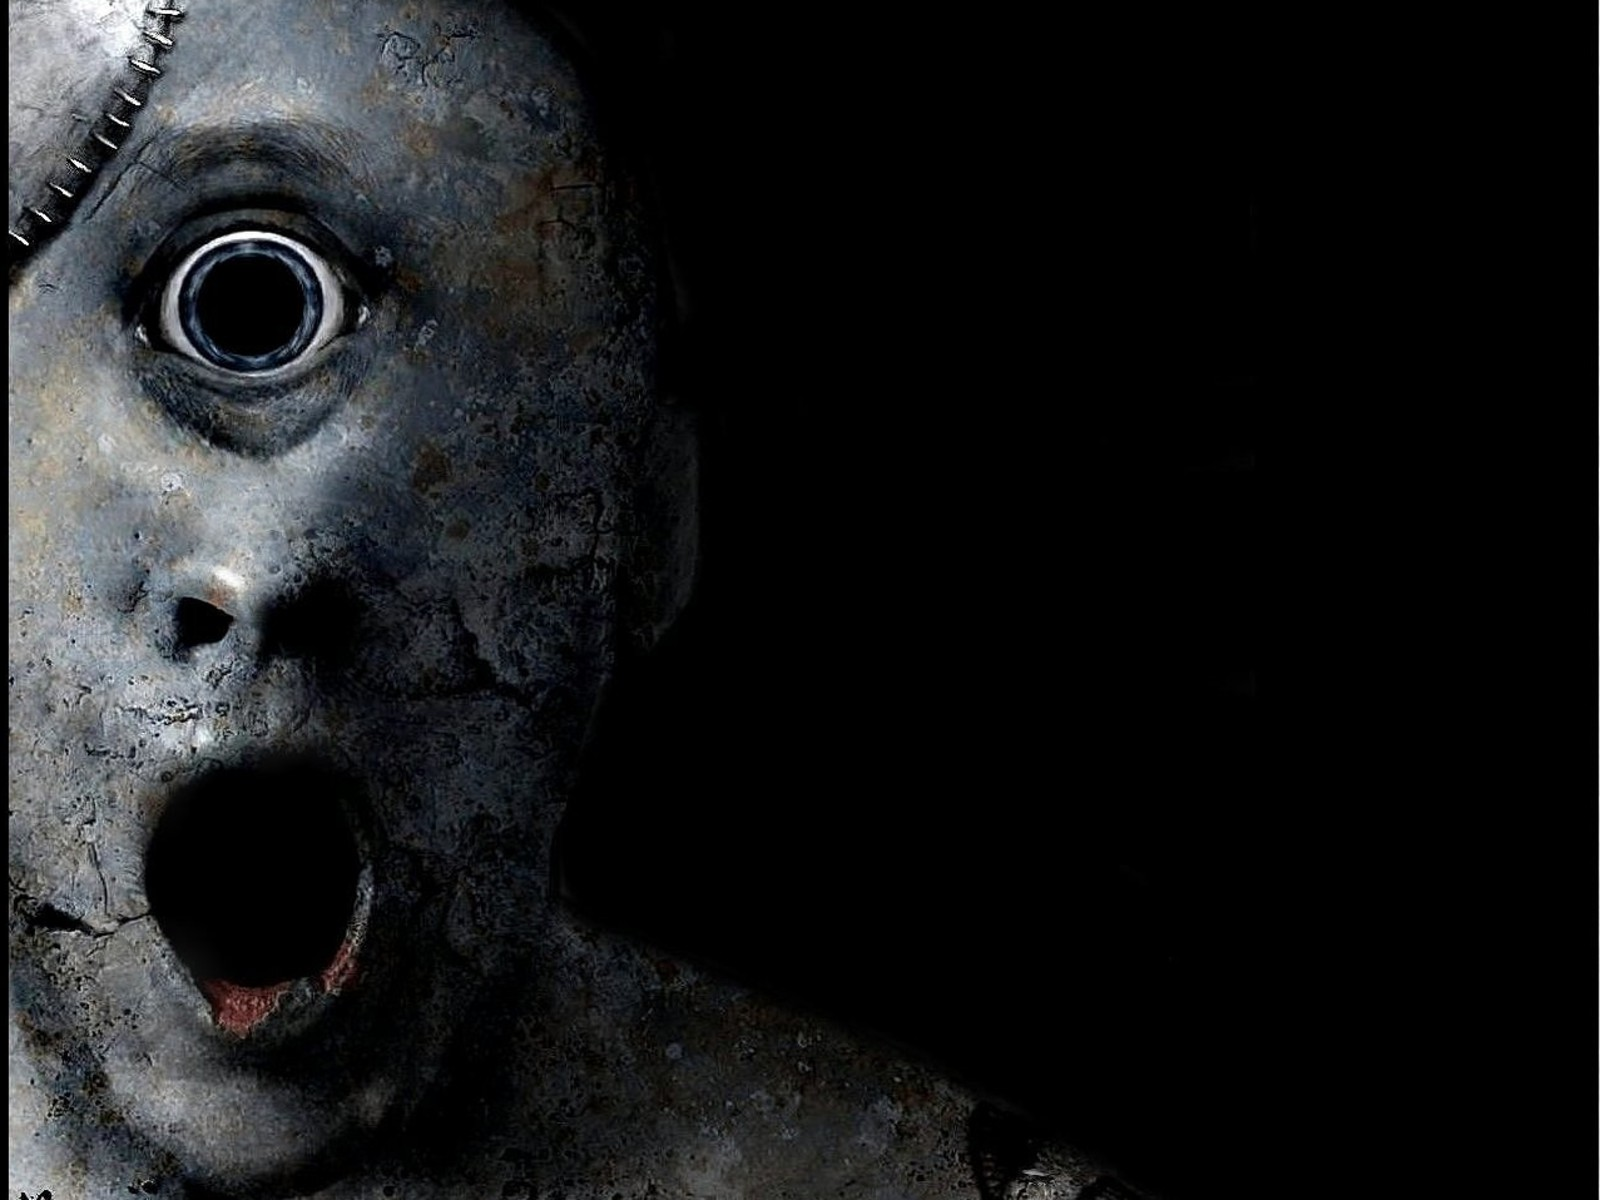 Horror Movies Wallpaper 1600x1200